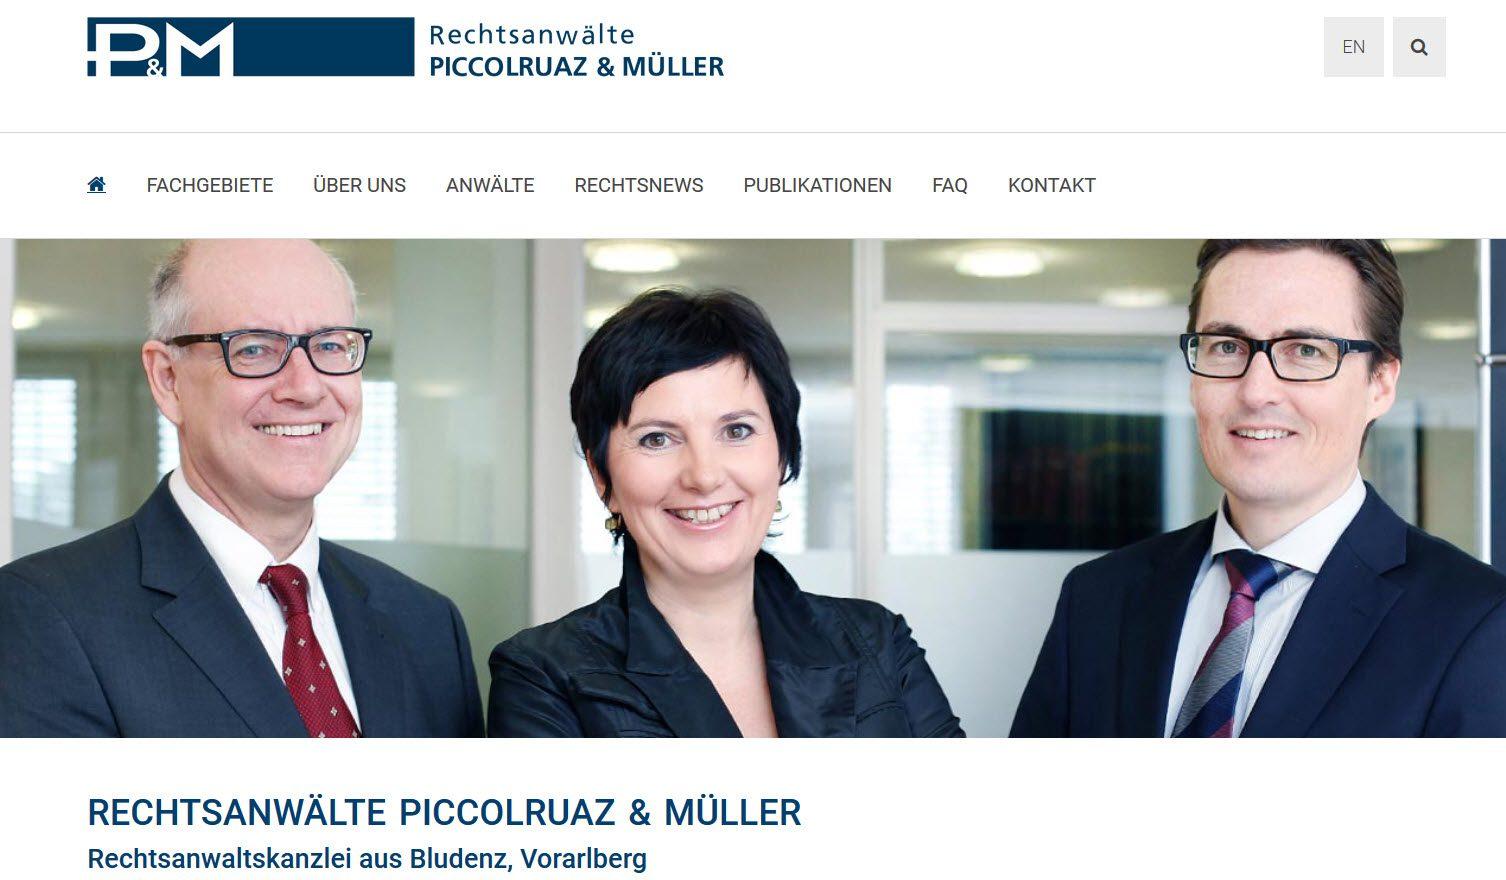 Rechtsanwälte PICCOLRUAZ & MÜLLER Bludenz